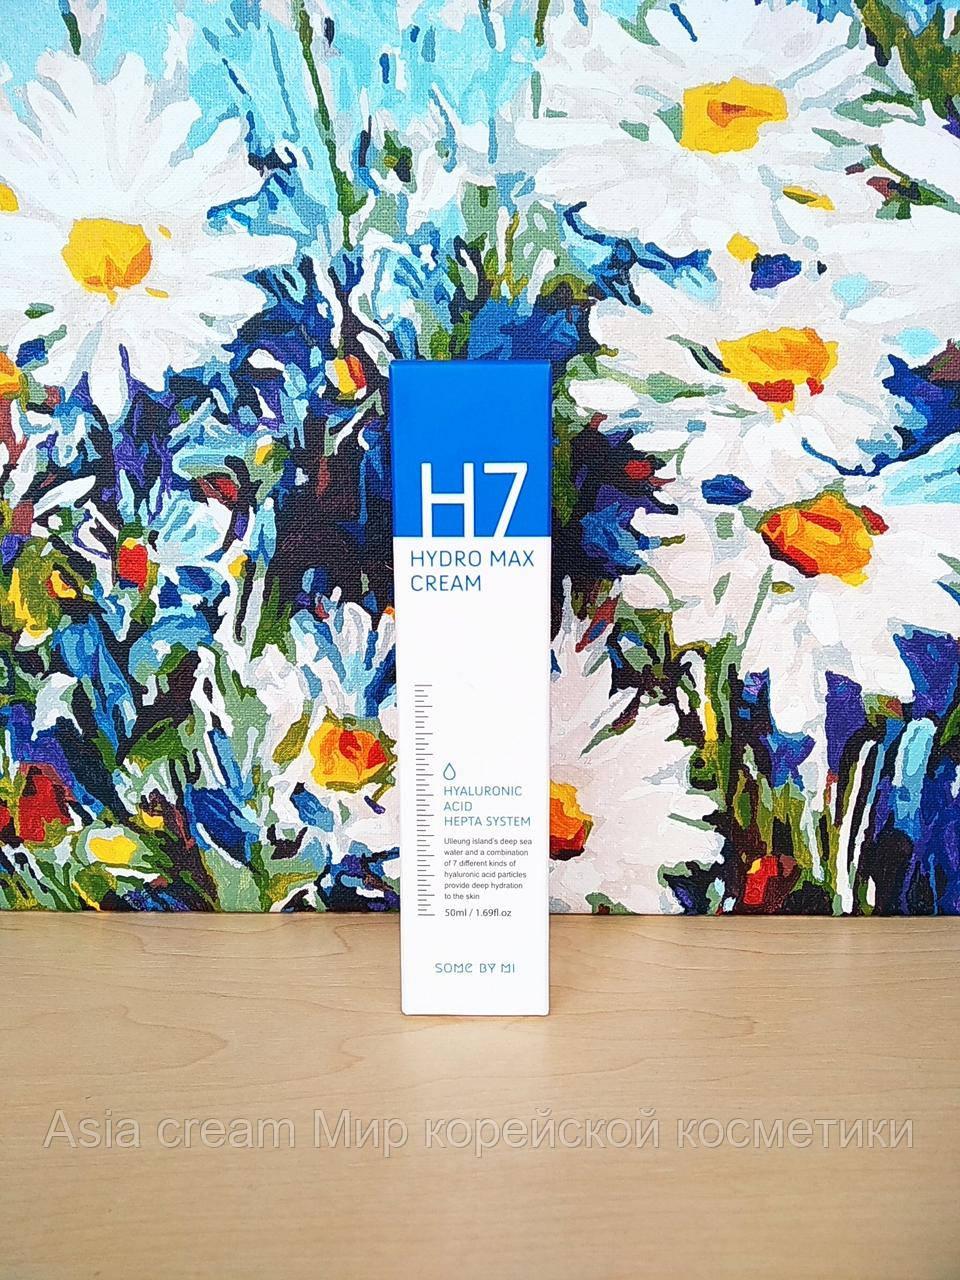 Интенсивно увлажняющий крем для лица Some By Mi H7 Hydro Max Cream